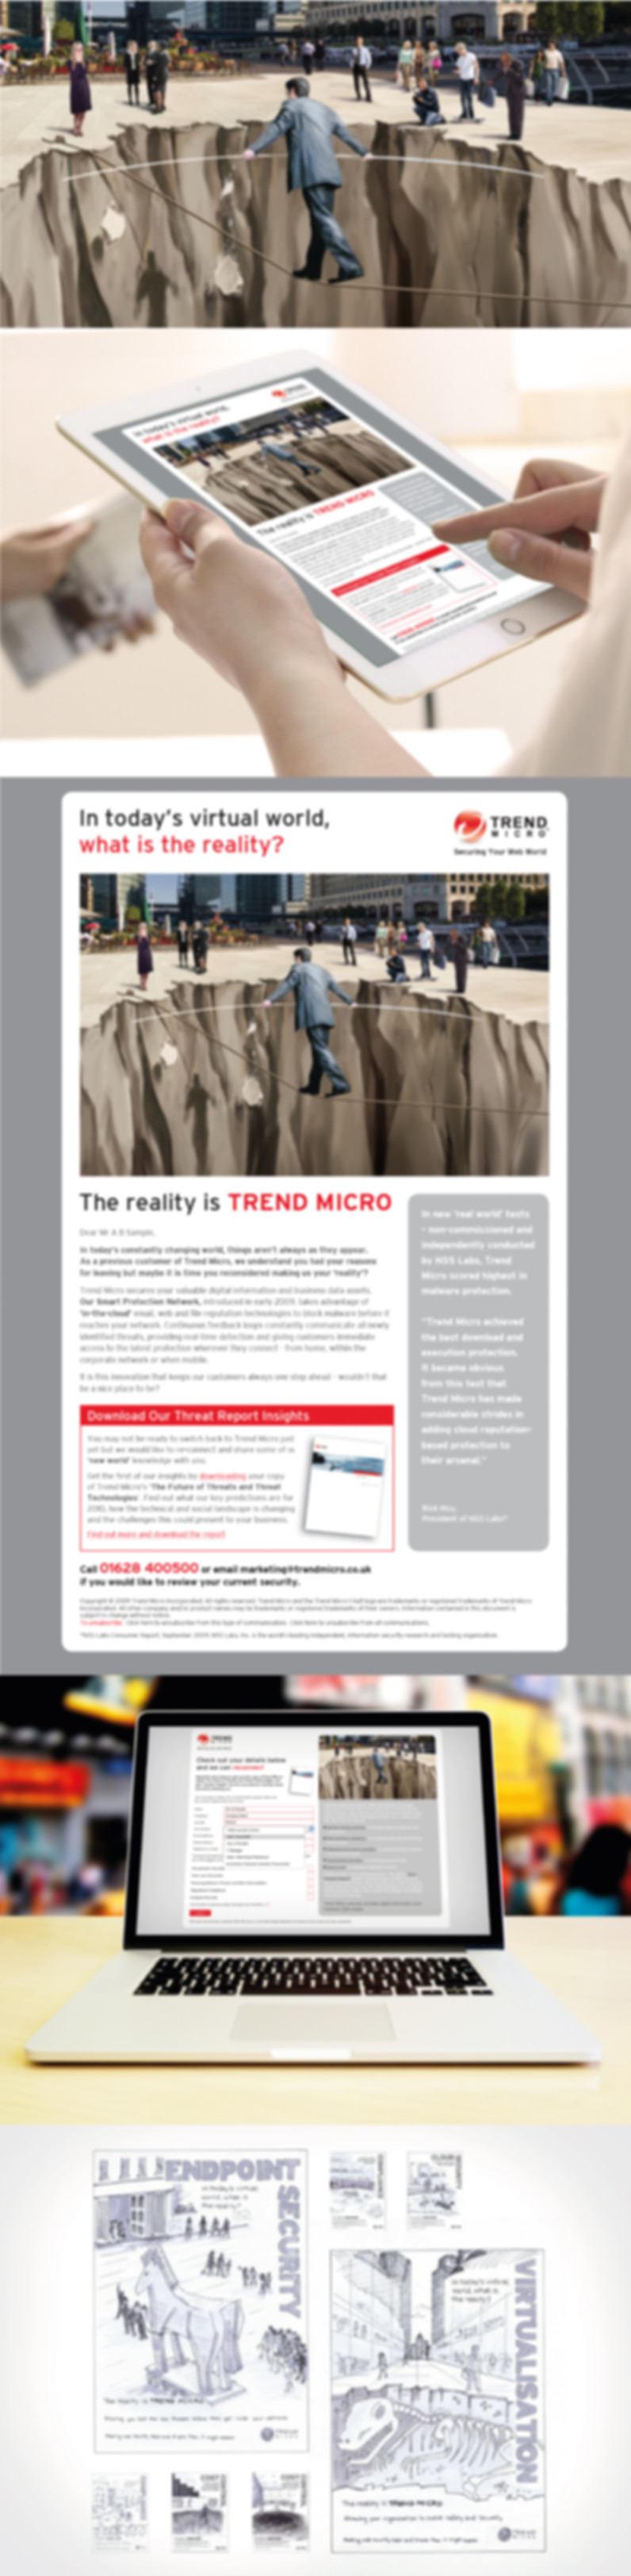 Trend-Micro.jpg